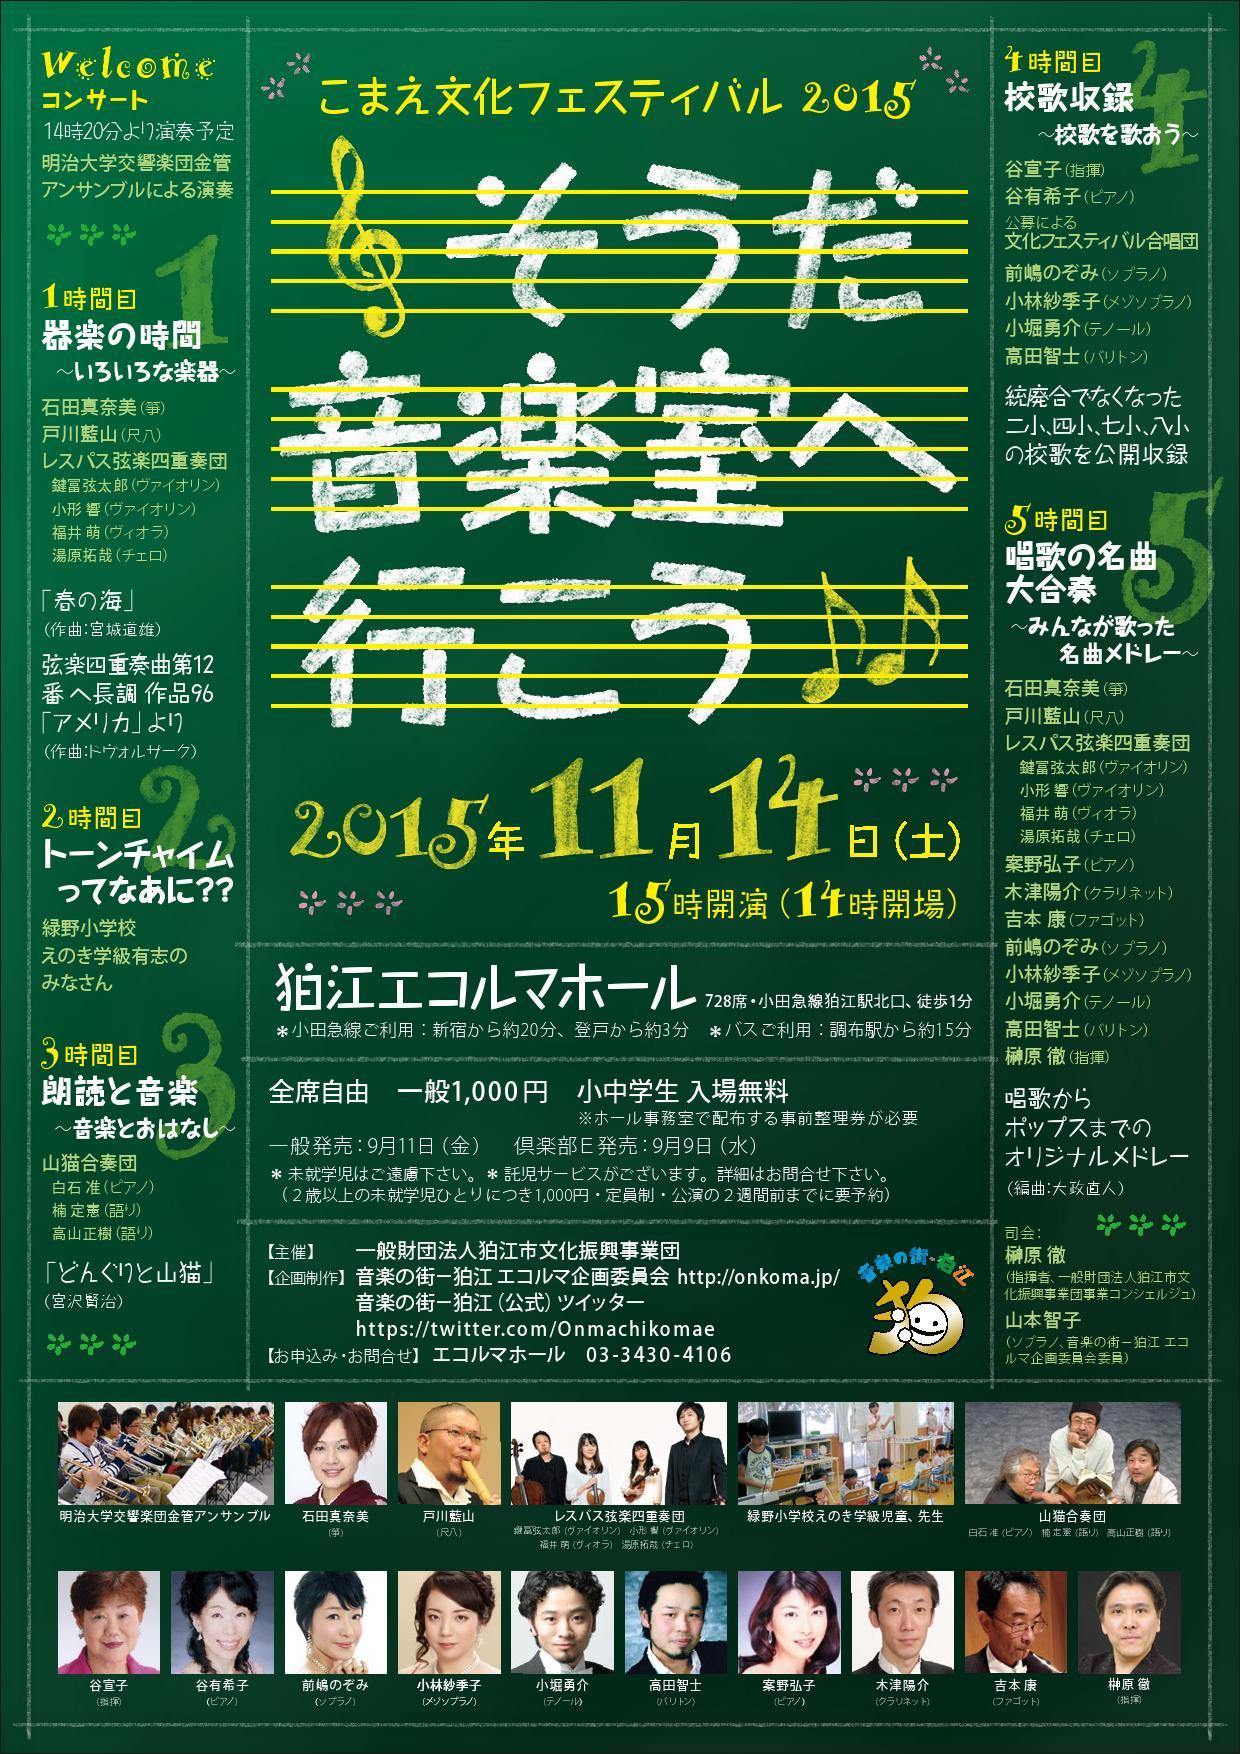 http://onkoma.jp/event/%E3%81%93%E3%81%BE%E3%81%88%E6%96%87%E5%8C%96%E3%83%95%E3%82%A7%E3%82%B92015_1509030001.jpg